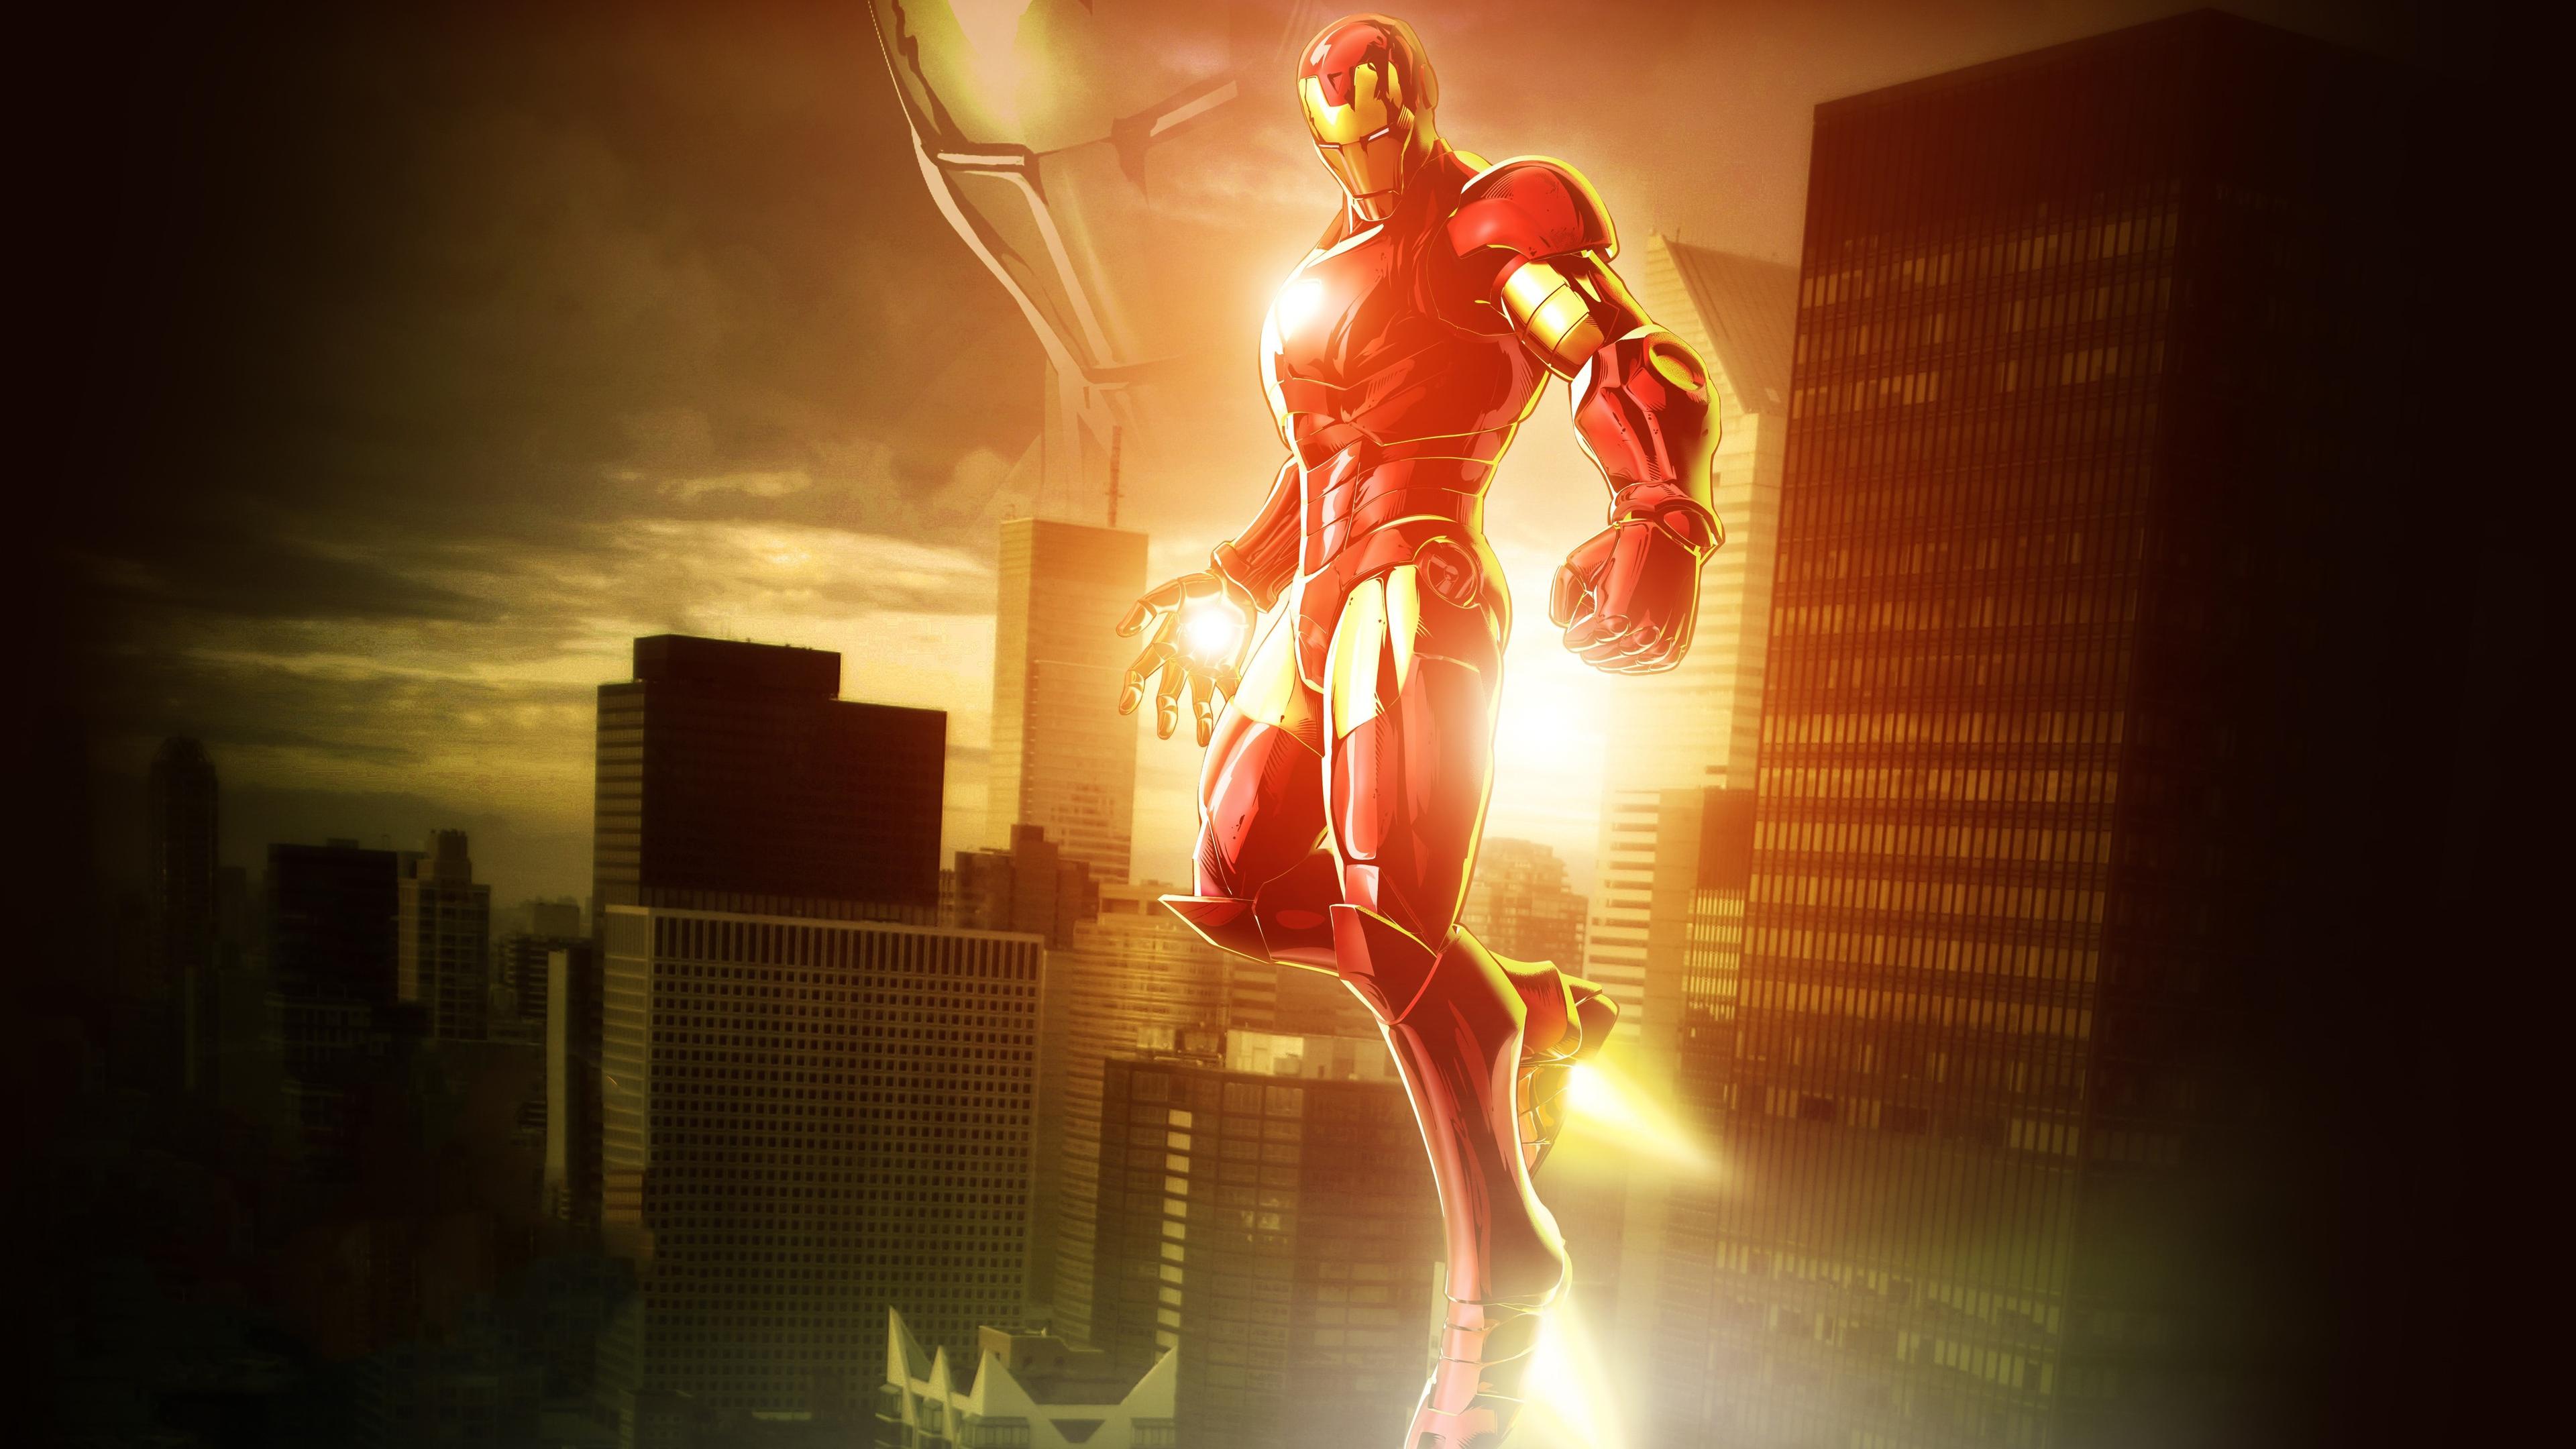 Wallpaper 4k Marvel Vs Capcom 3 Iron Man 4k 2017 Games Wallpapers